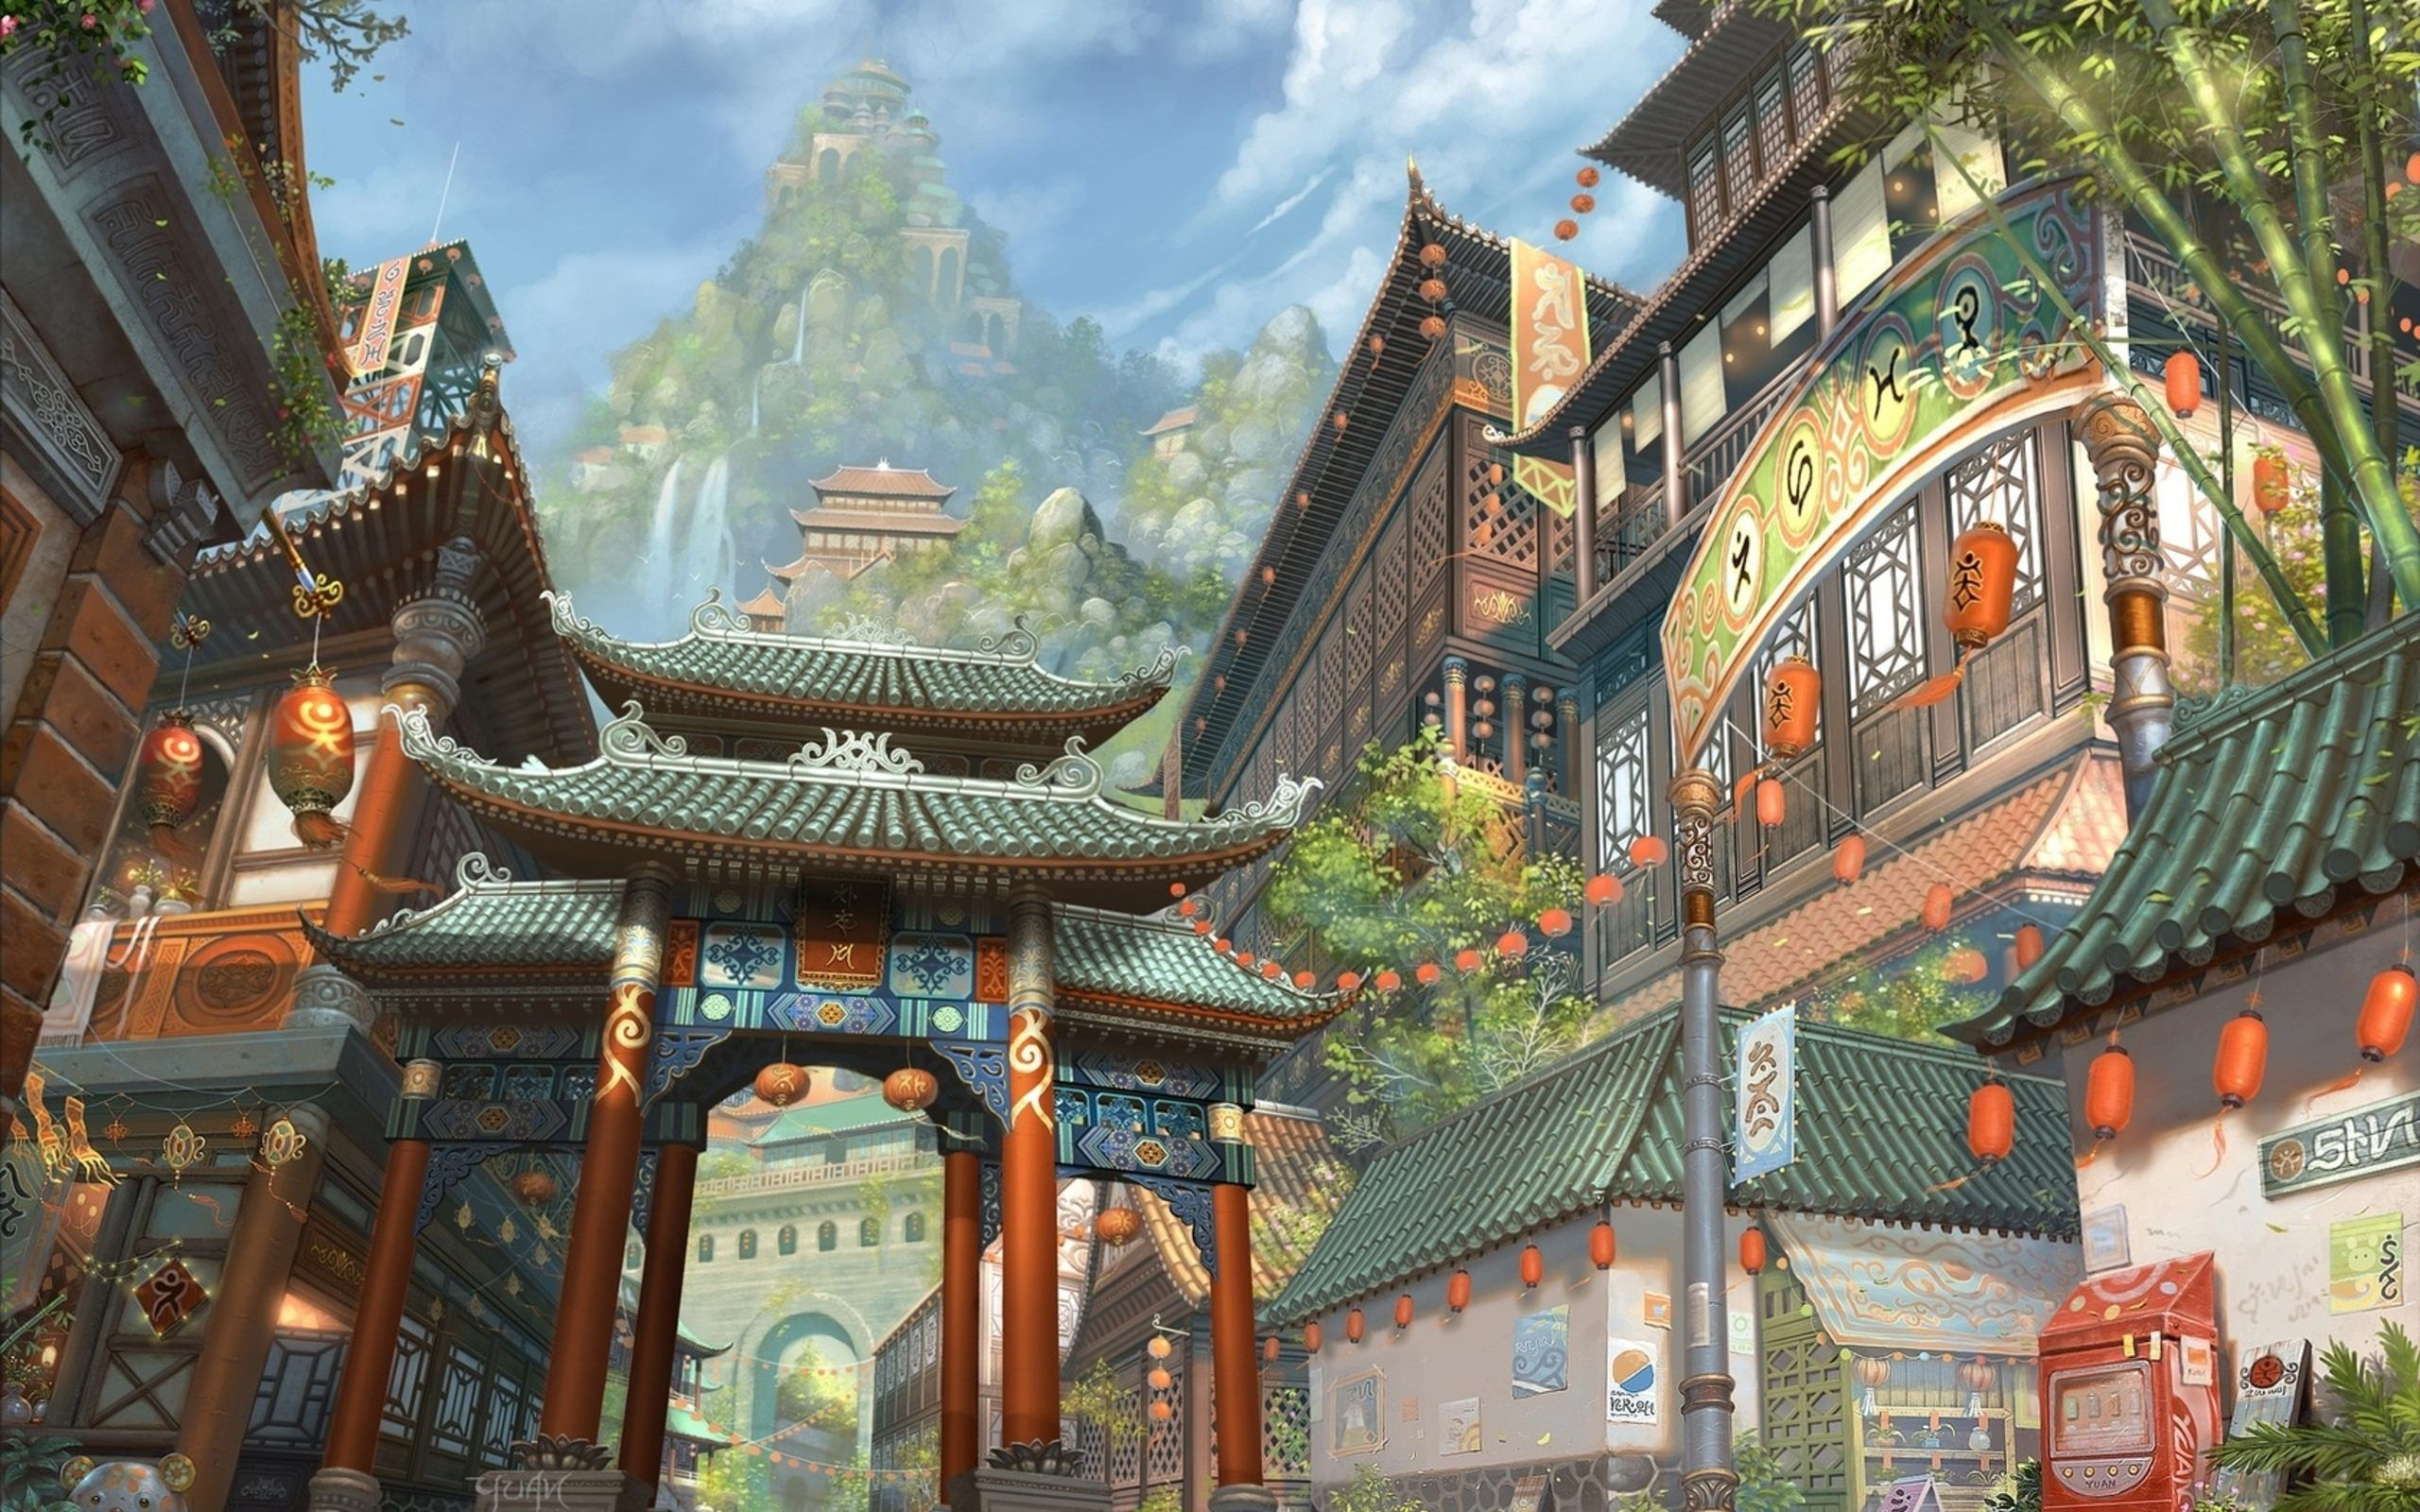 Japanese Art Painting Fantasy Wallpaper For Desktop And Mobile In High Resolution Free Download We Have Best C Fantasy Concept Art City Scene Japanese Fantasy